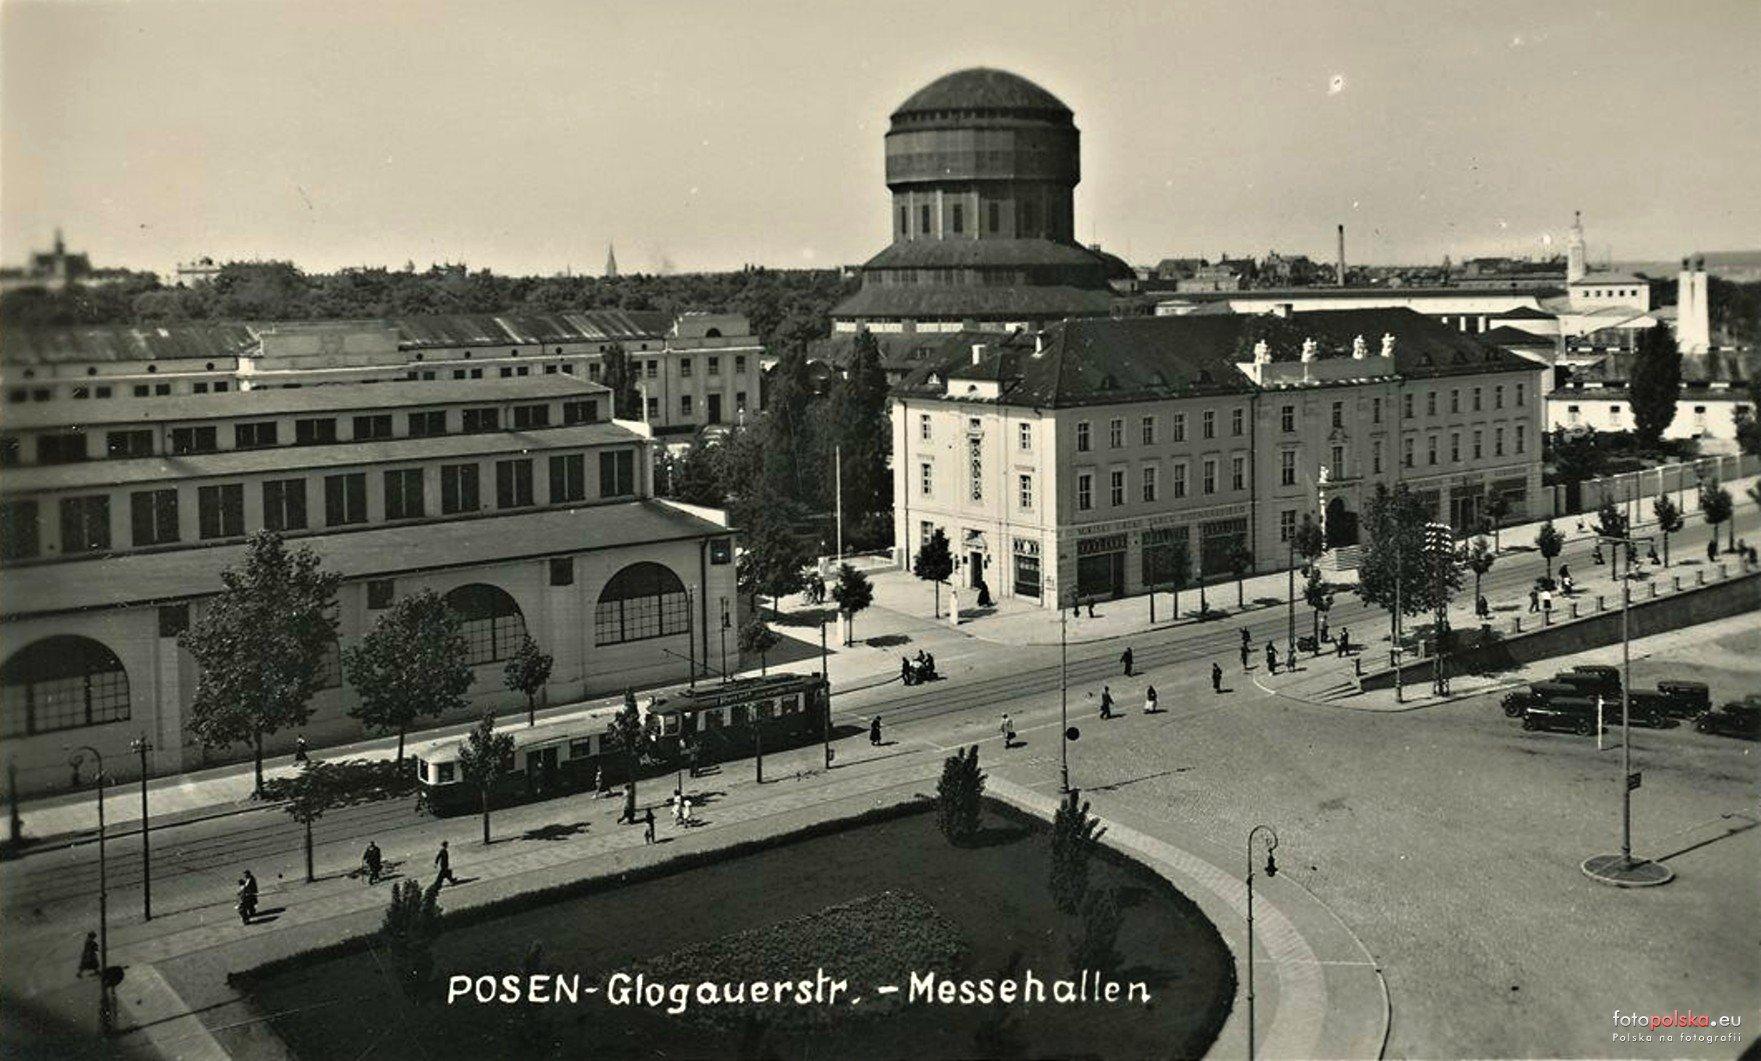 http://fotopolska.eu/foto/17/17296.jpg